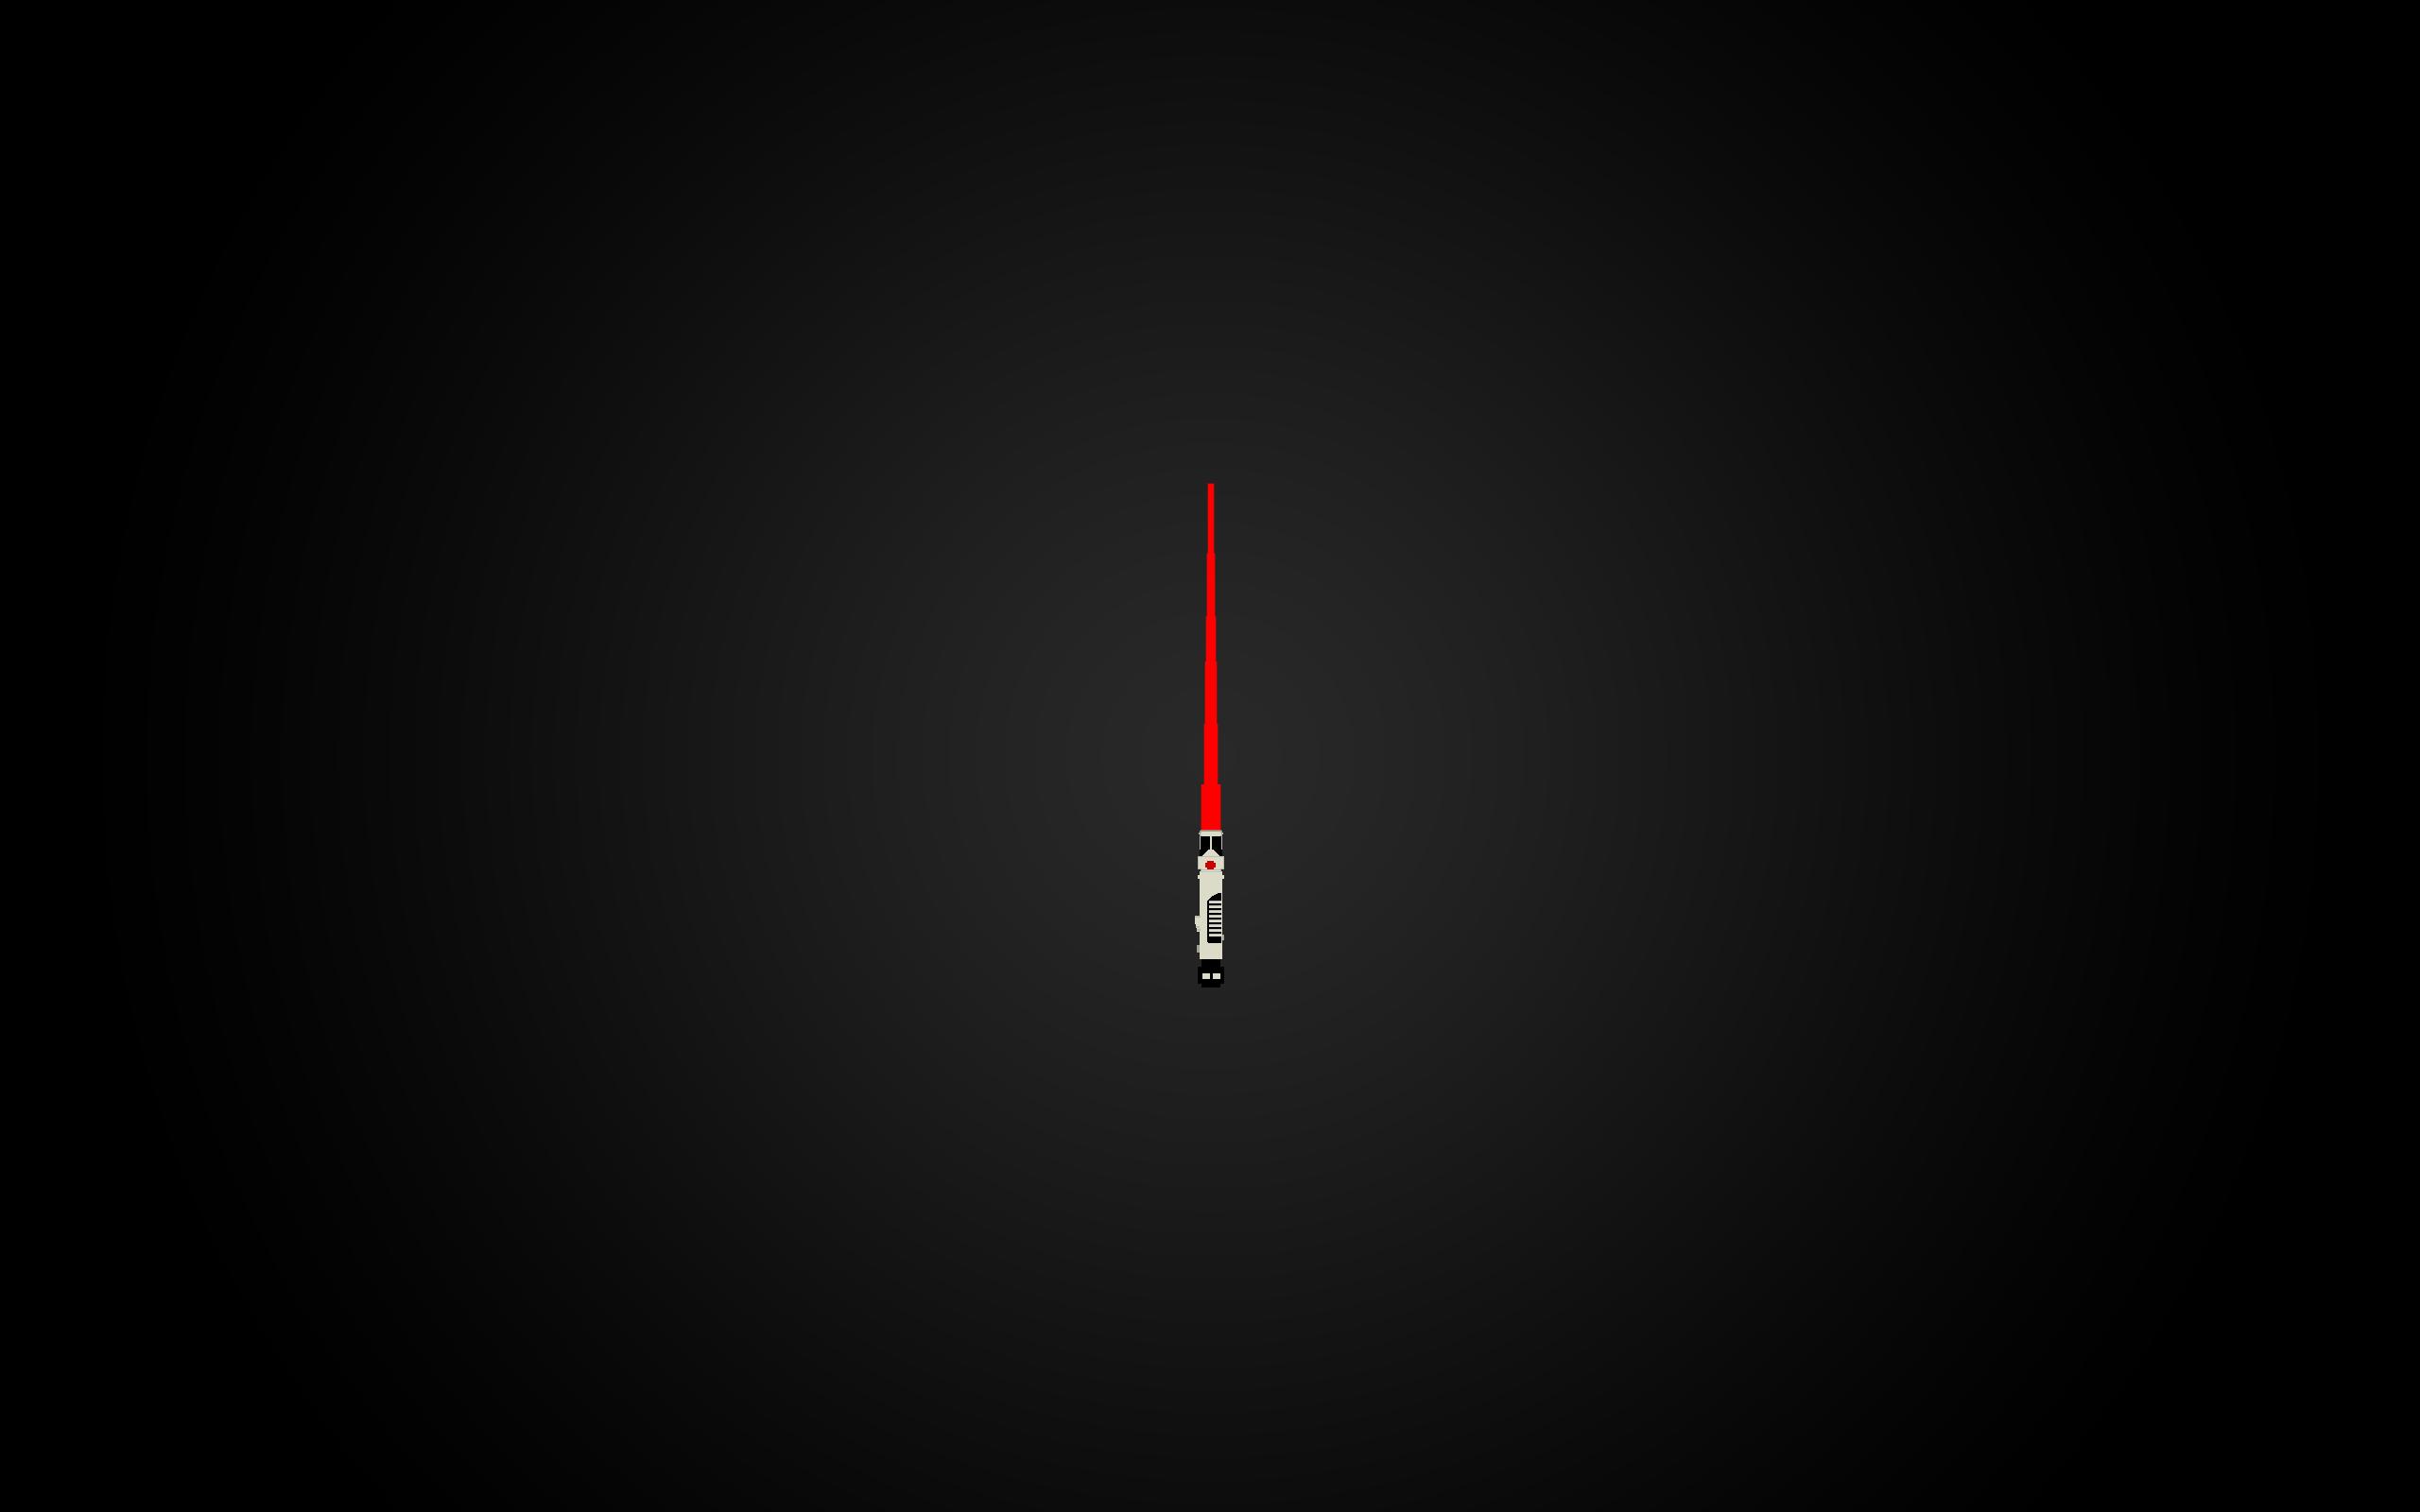 star wars cool iphone wallpaper